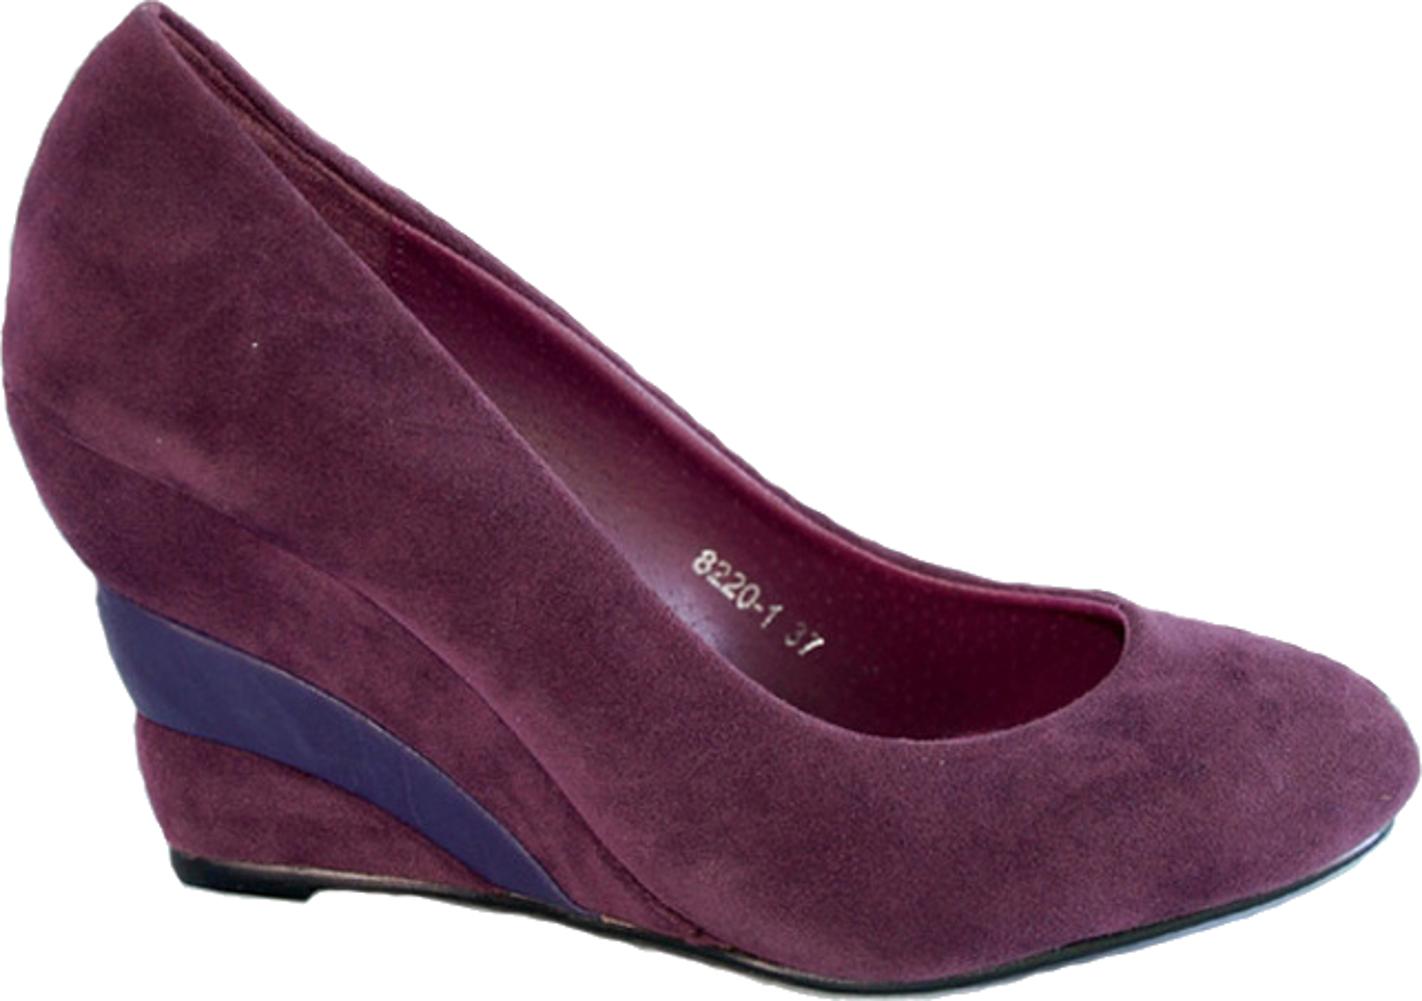 reto wedge heel suede 2 tone wedges court shoes purple